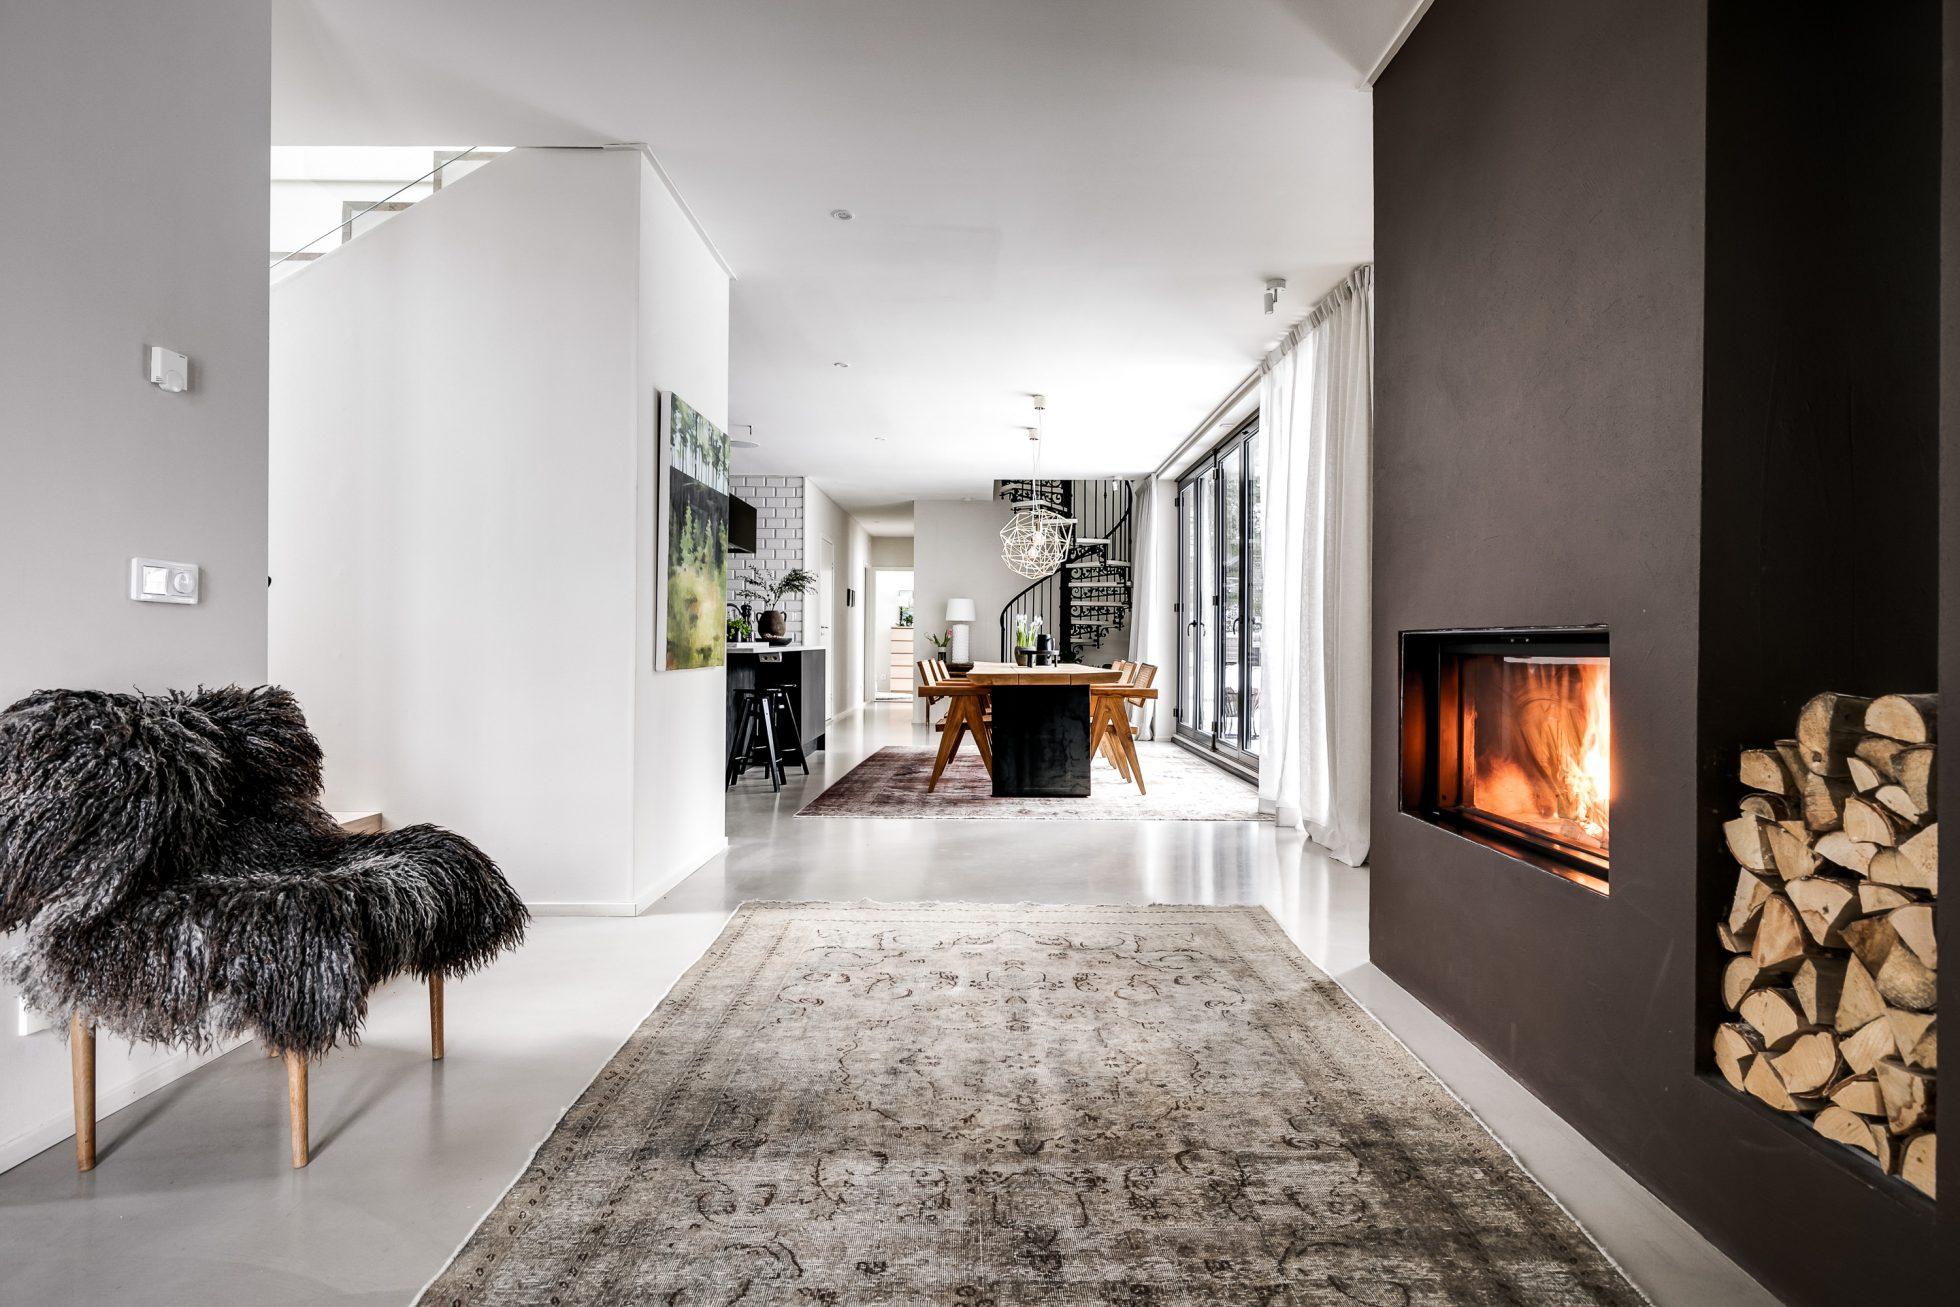 Kika in i arkitektritade villan